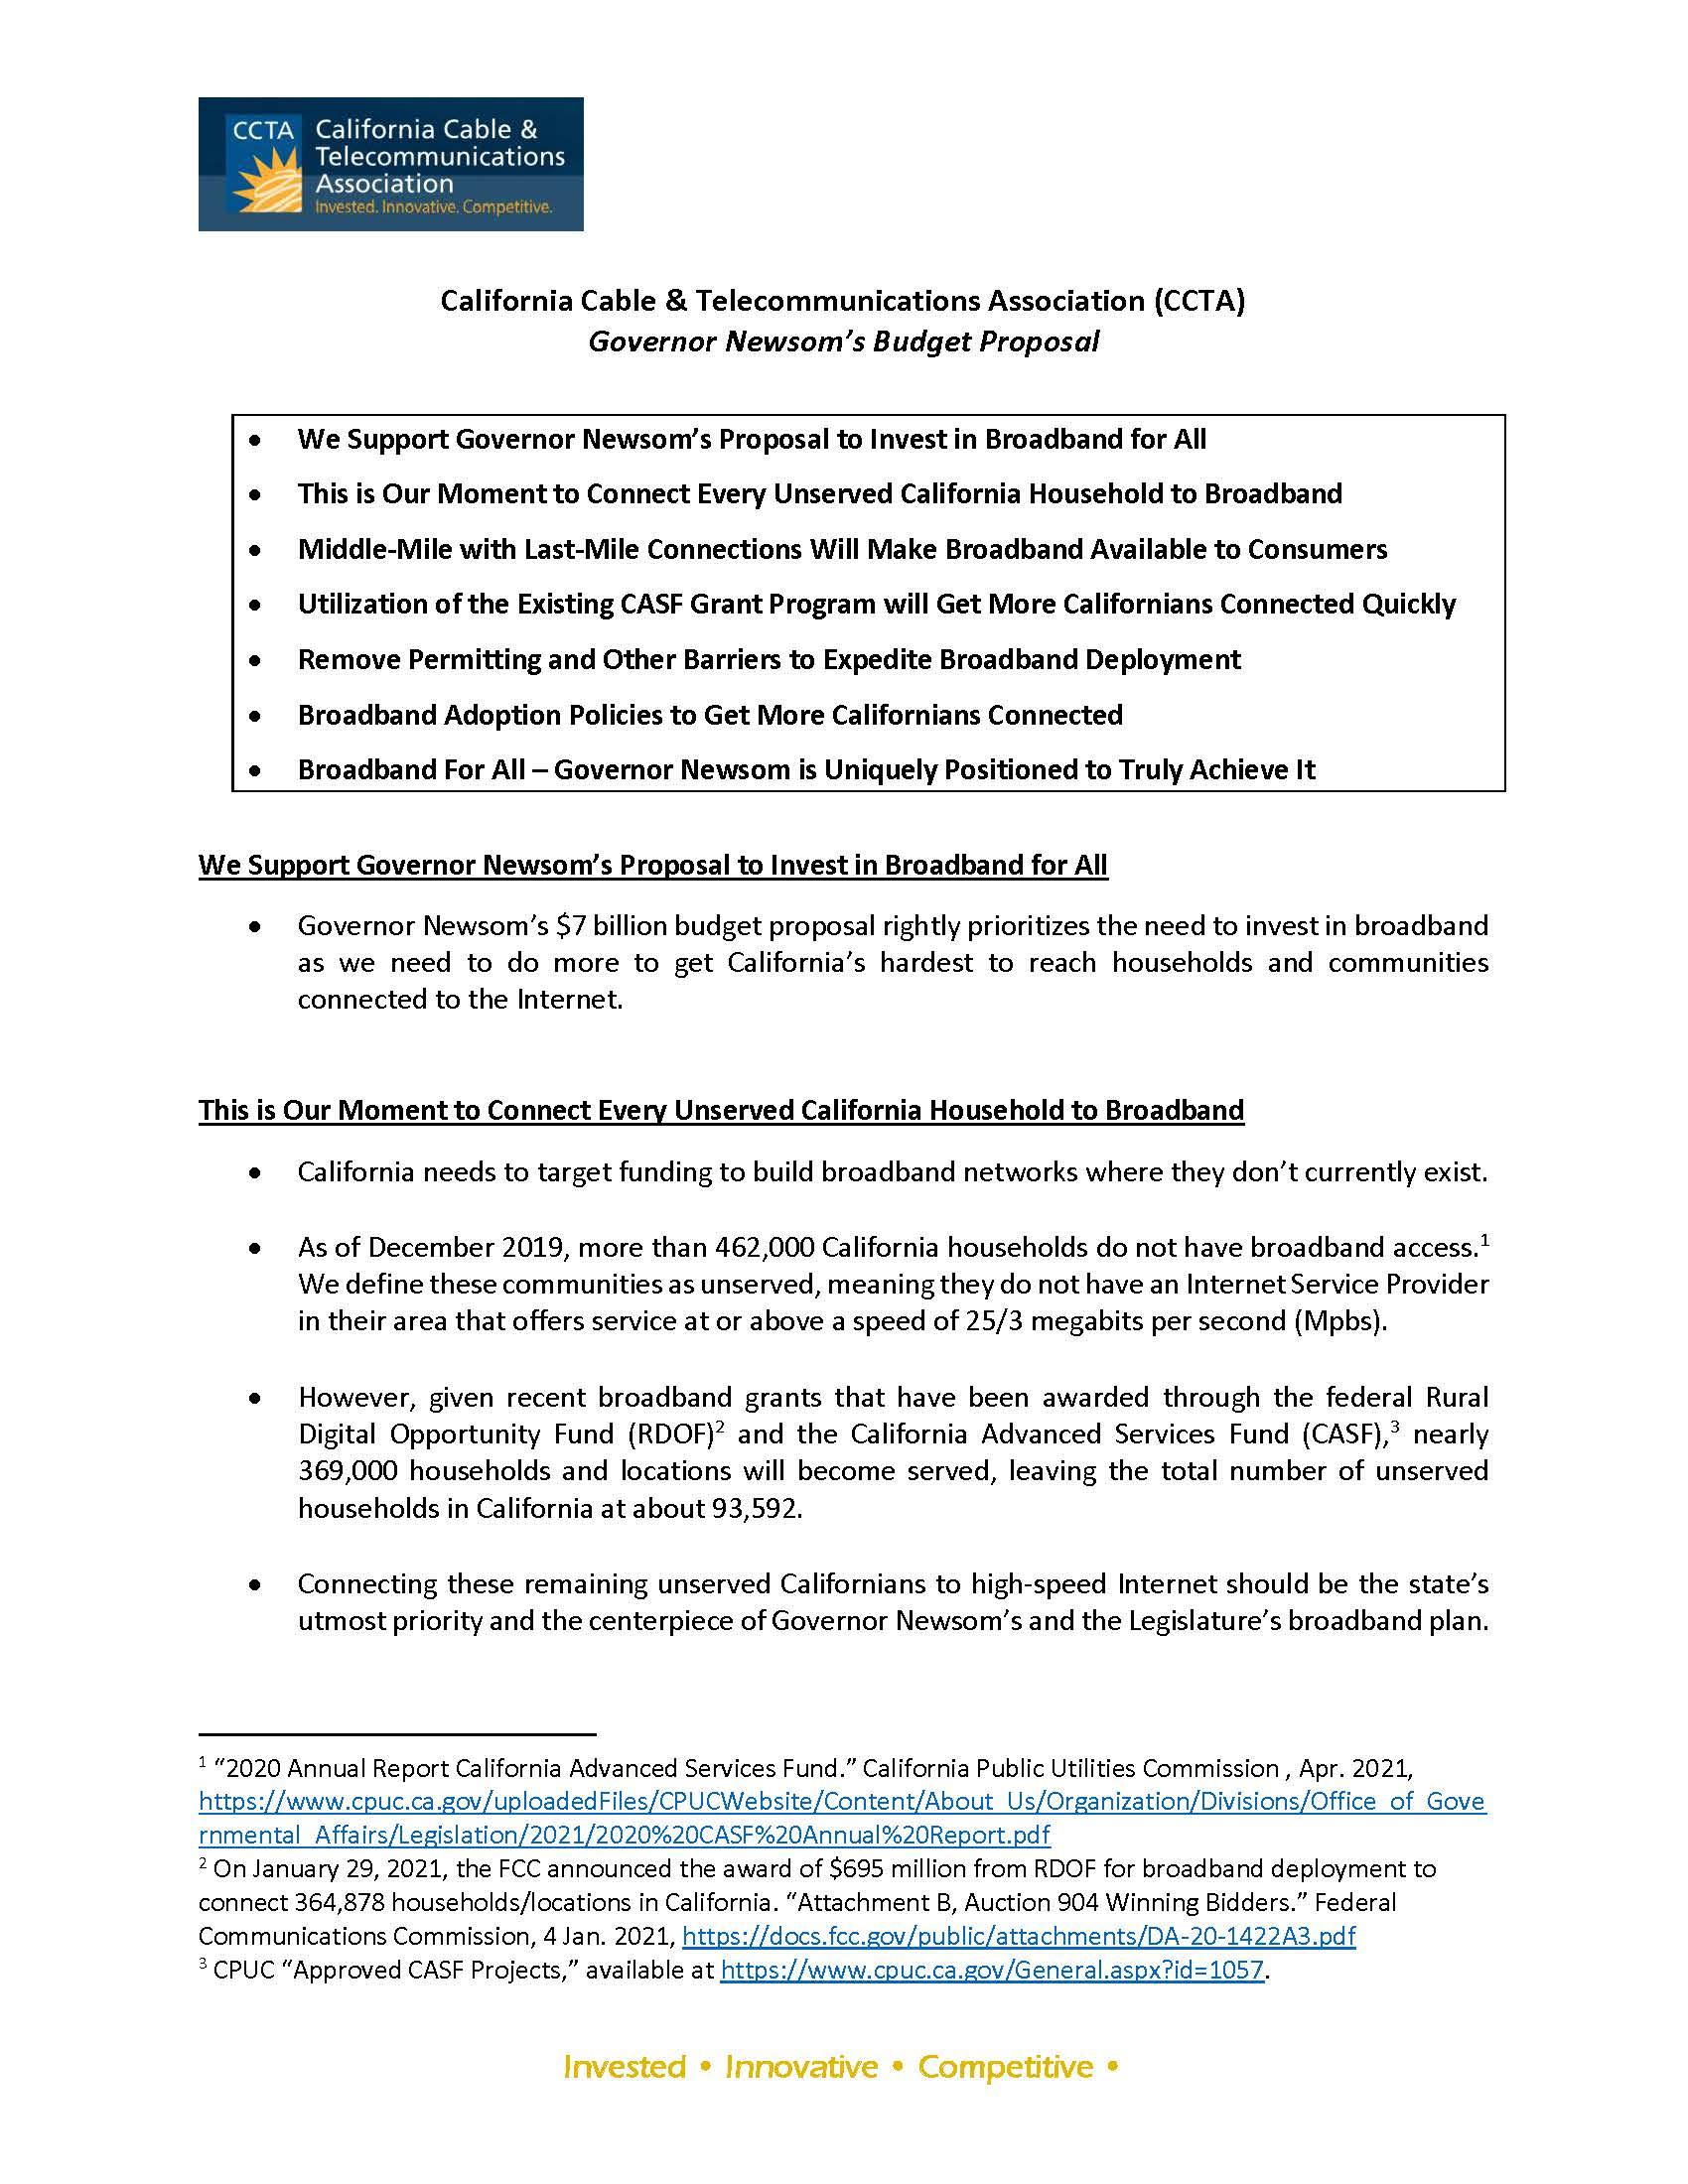 CCTA Overview_Governor Newsom's Broadband Proposal_Final_Page_1